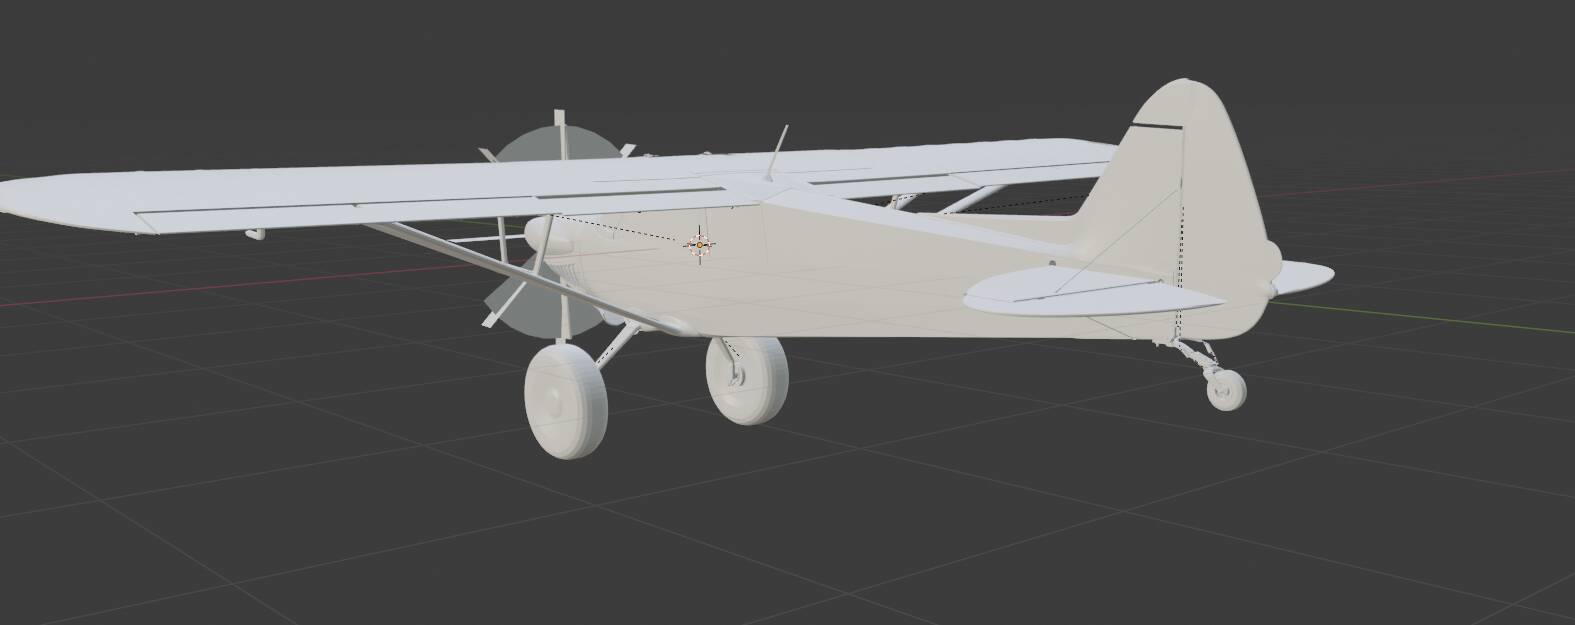 Blender_ C__Users_pilot_Desktop_asobo-aircraft-xcub-180HP-v1.7.8_SimObjects_Airplanes_Asobo_XCub-180_model_asobo_xcub.blend 11_8_2020 5_59_21 PM (2)